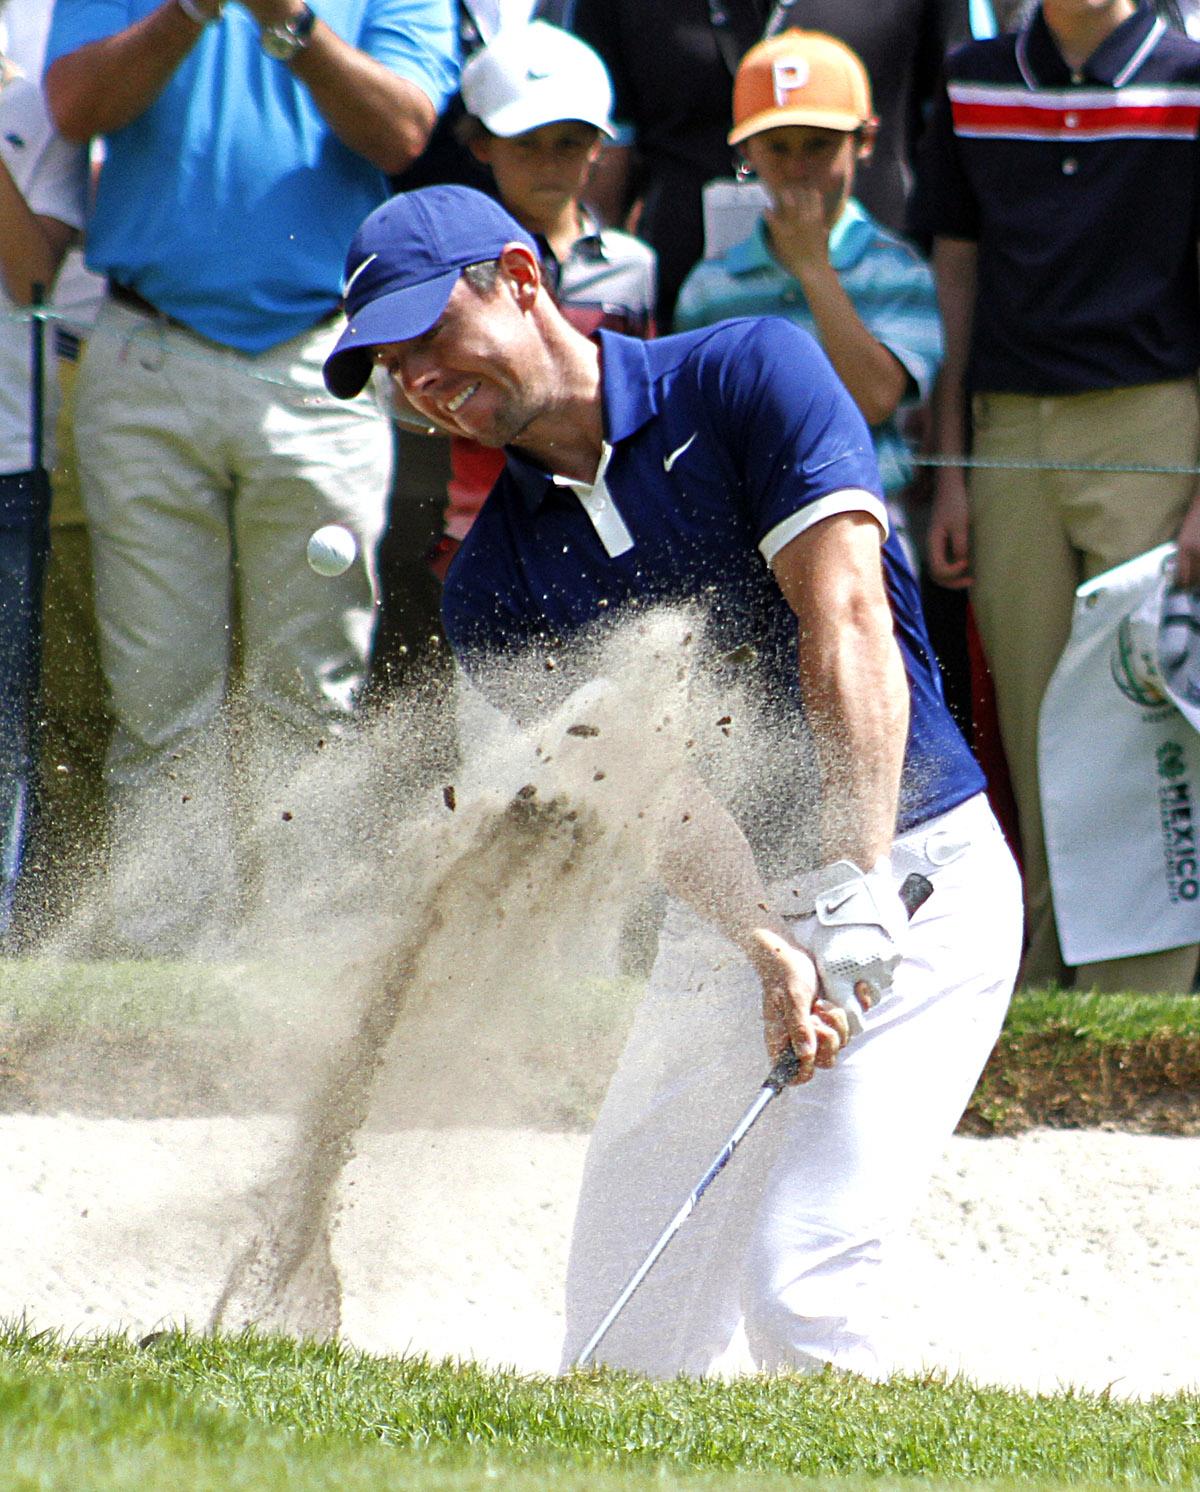 Rory Mcllroy de Irlanda del Norte en la tercera ronda del World Golf Championships, México Championships 2019